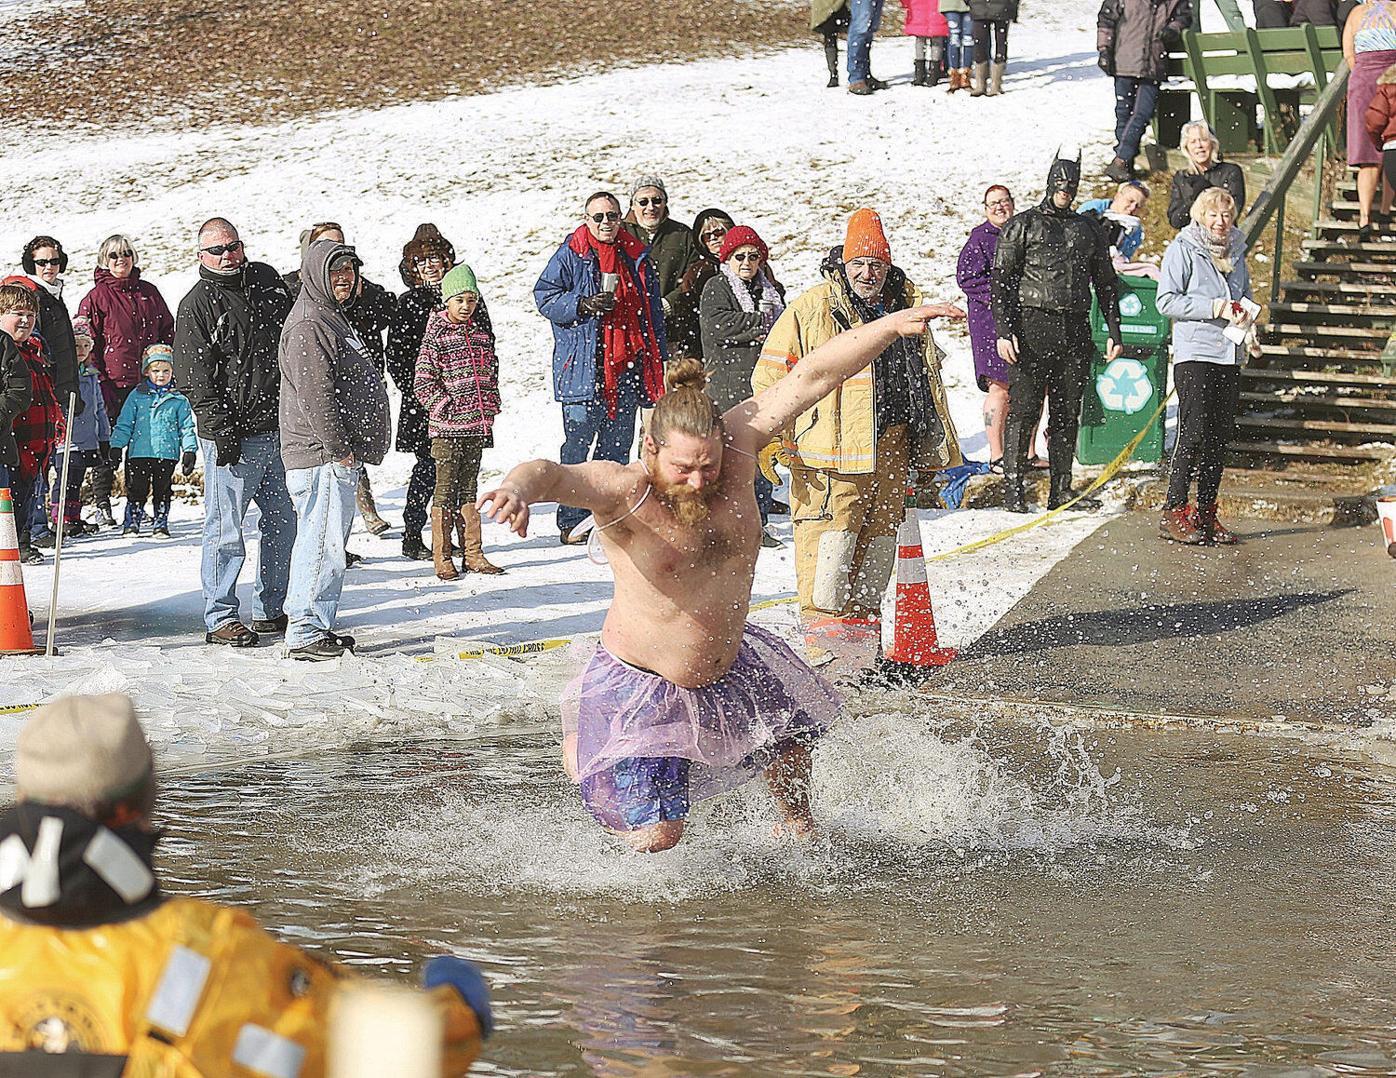 Winter fun at Winterfest